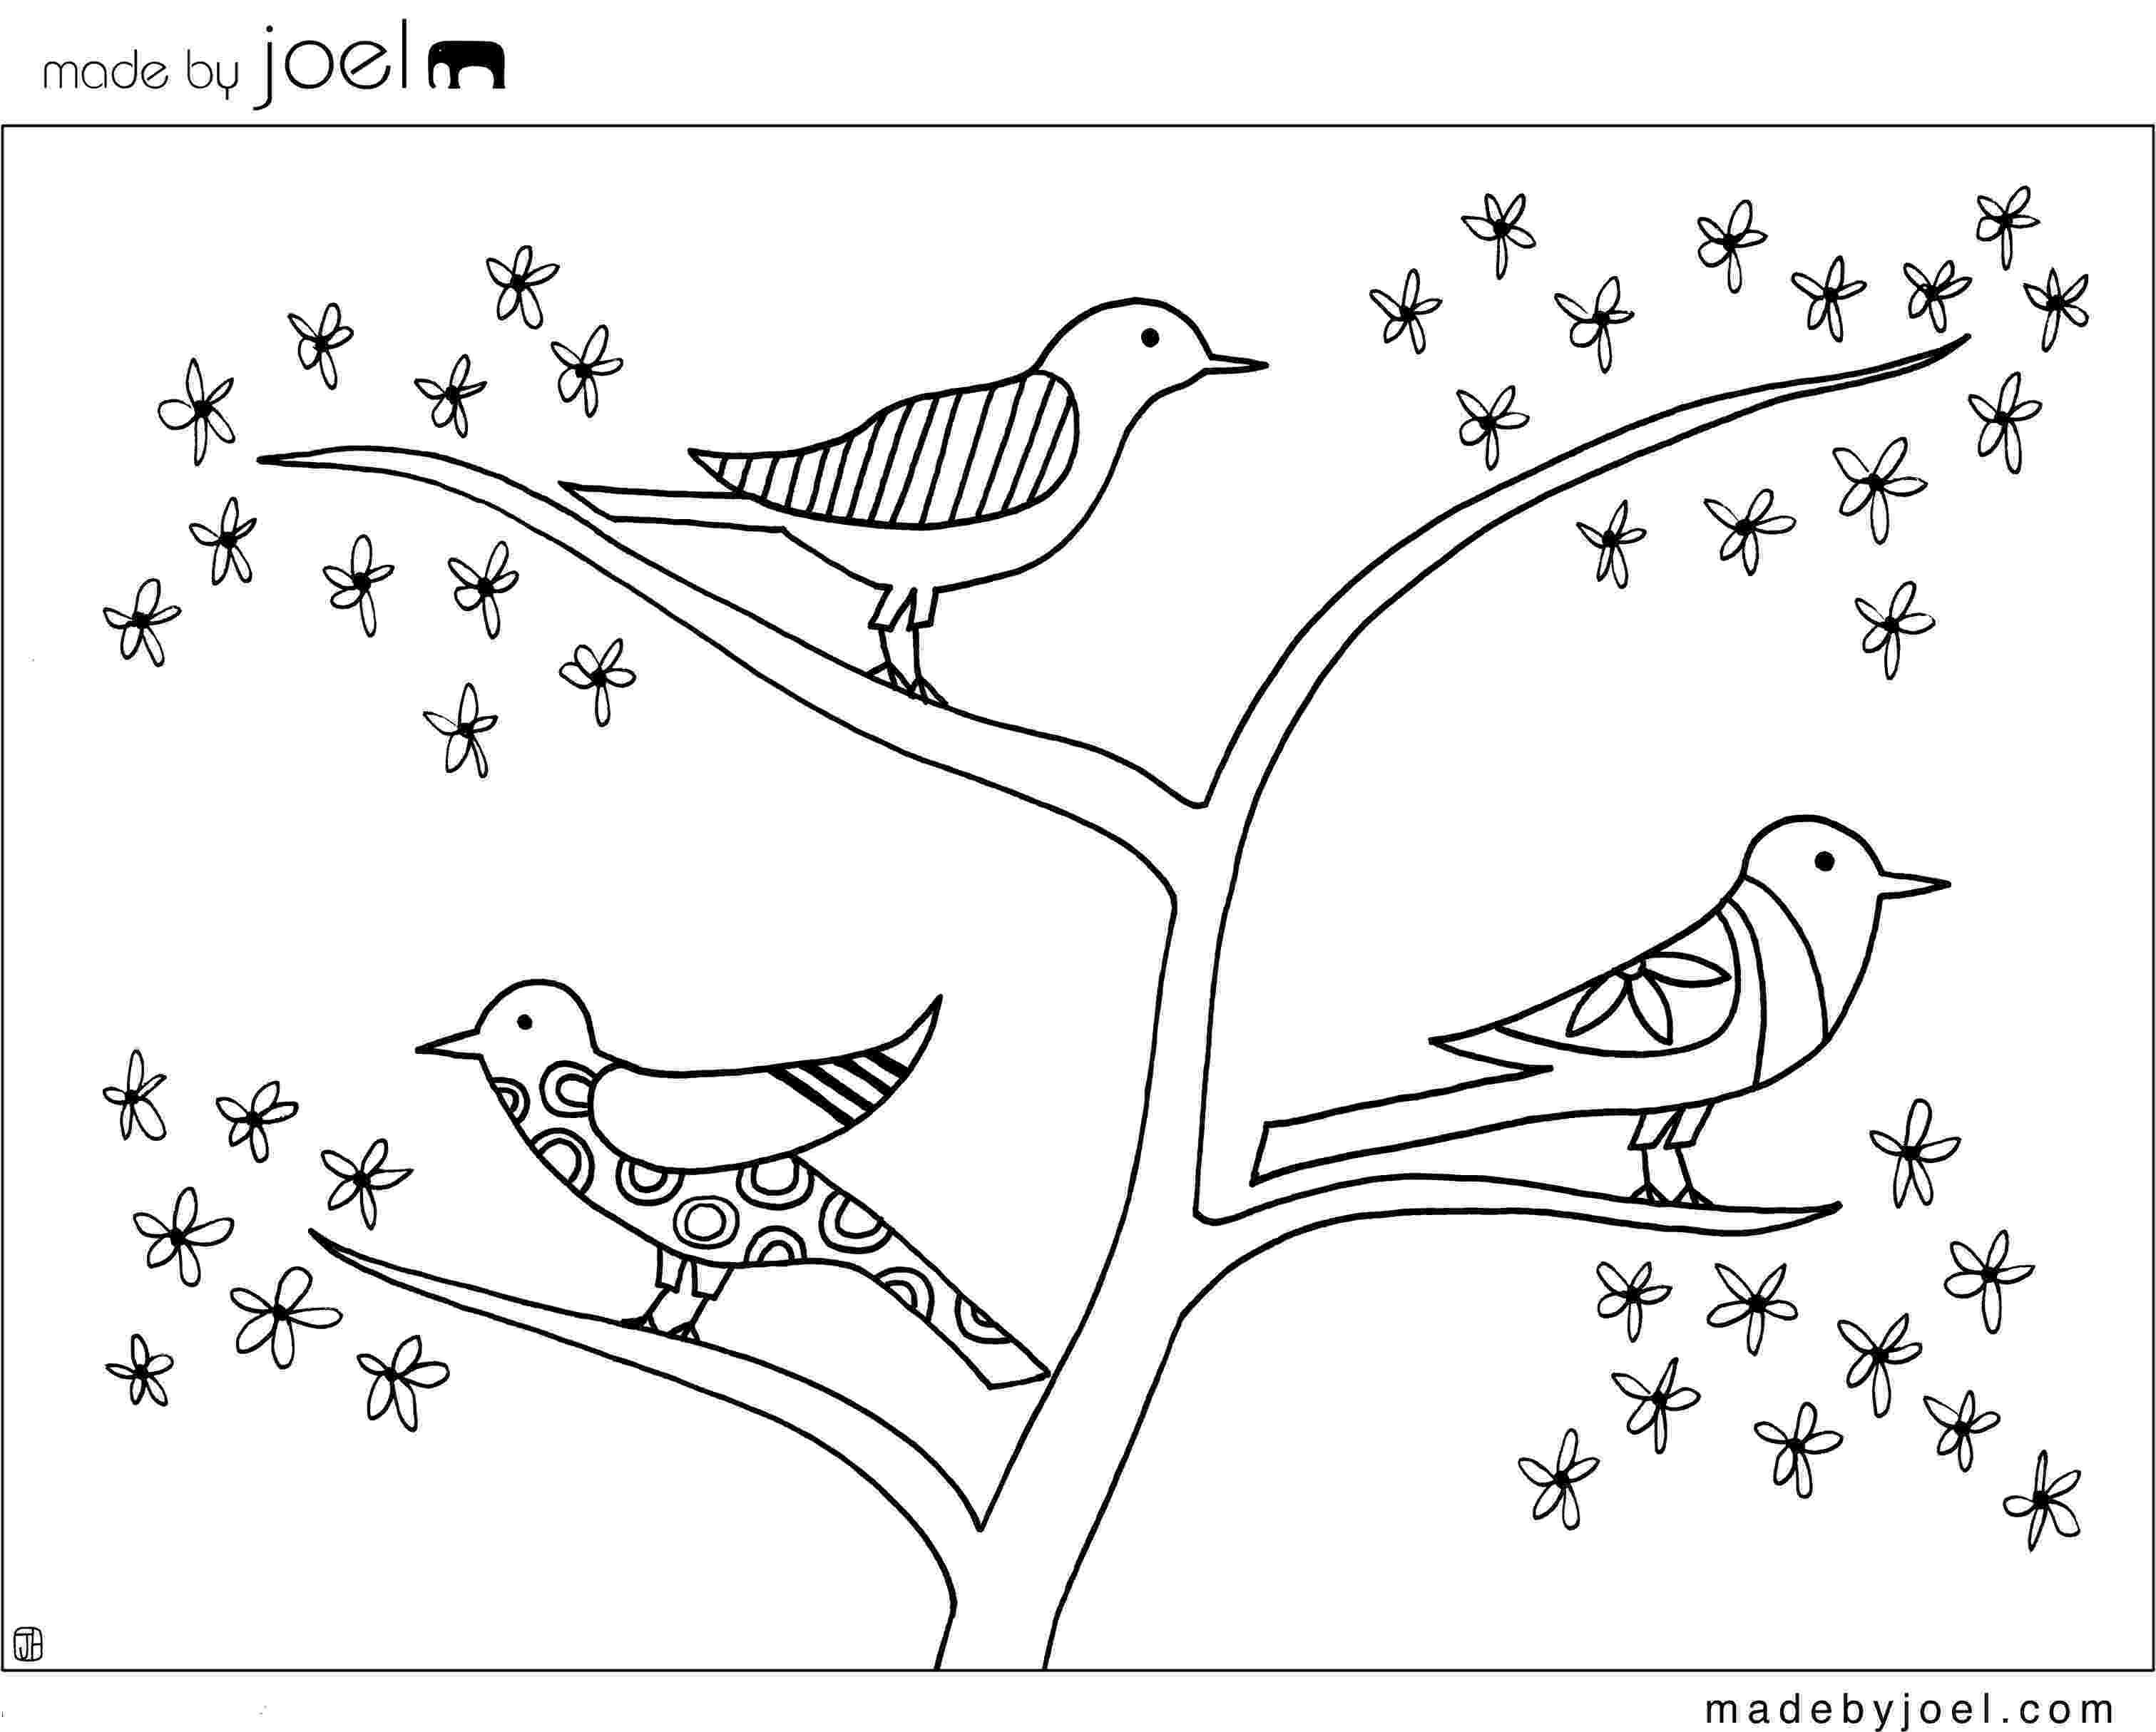 colouring picture bird parrot bird coloring page wecoloringpagecom picture bird colouring